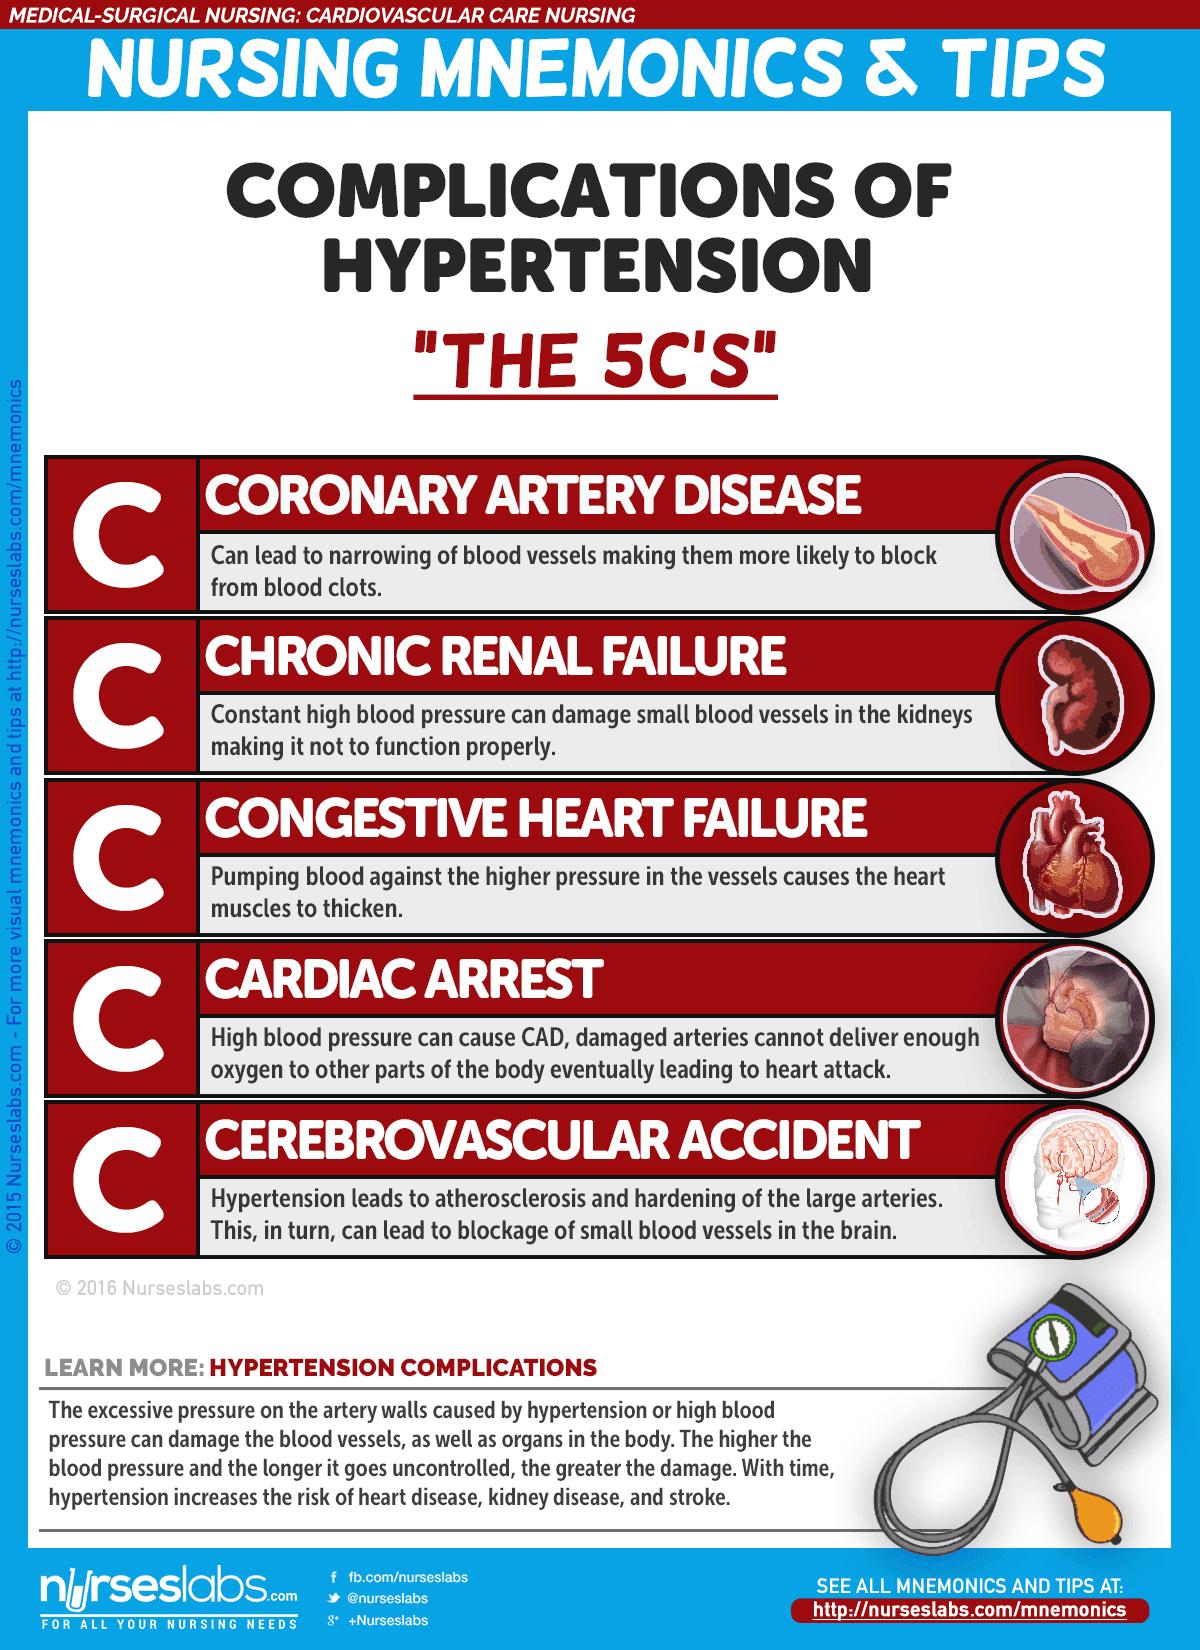 Cardiovascular Care Nursing Mnemonics and Tips | Nursing ...